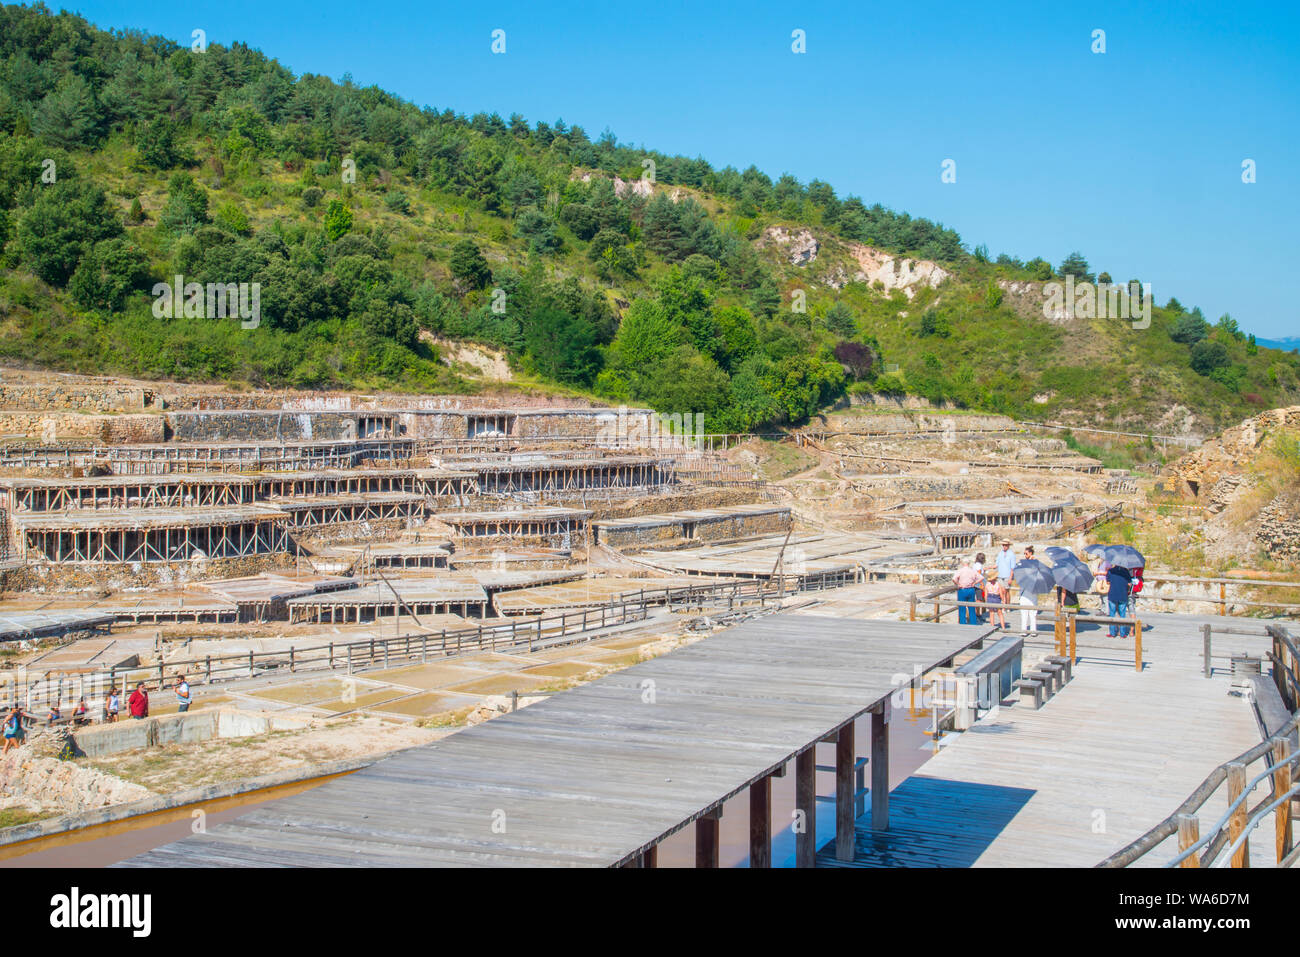 People visiting the saltworks. Salinas de Añana, Alava province, Basque Country, Spain. Stock Photo